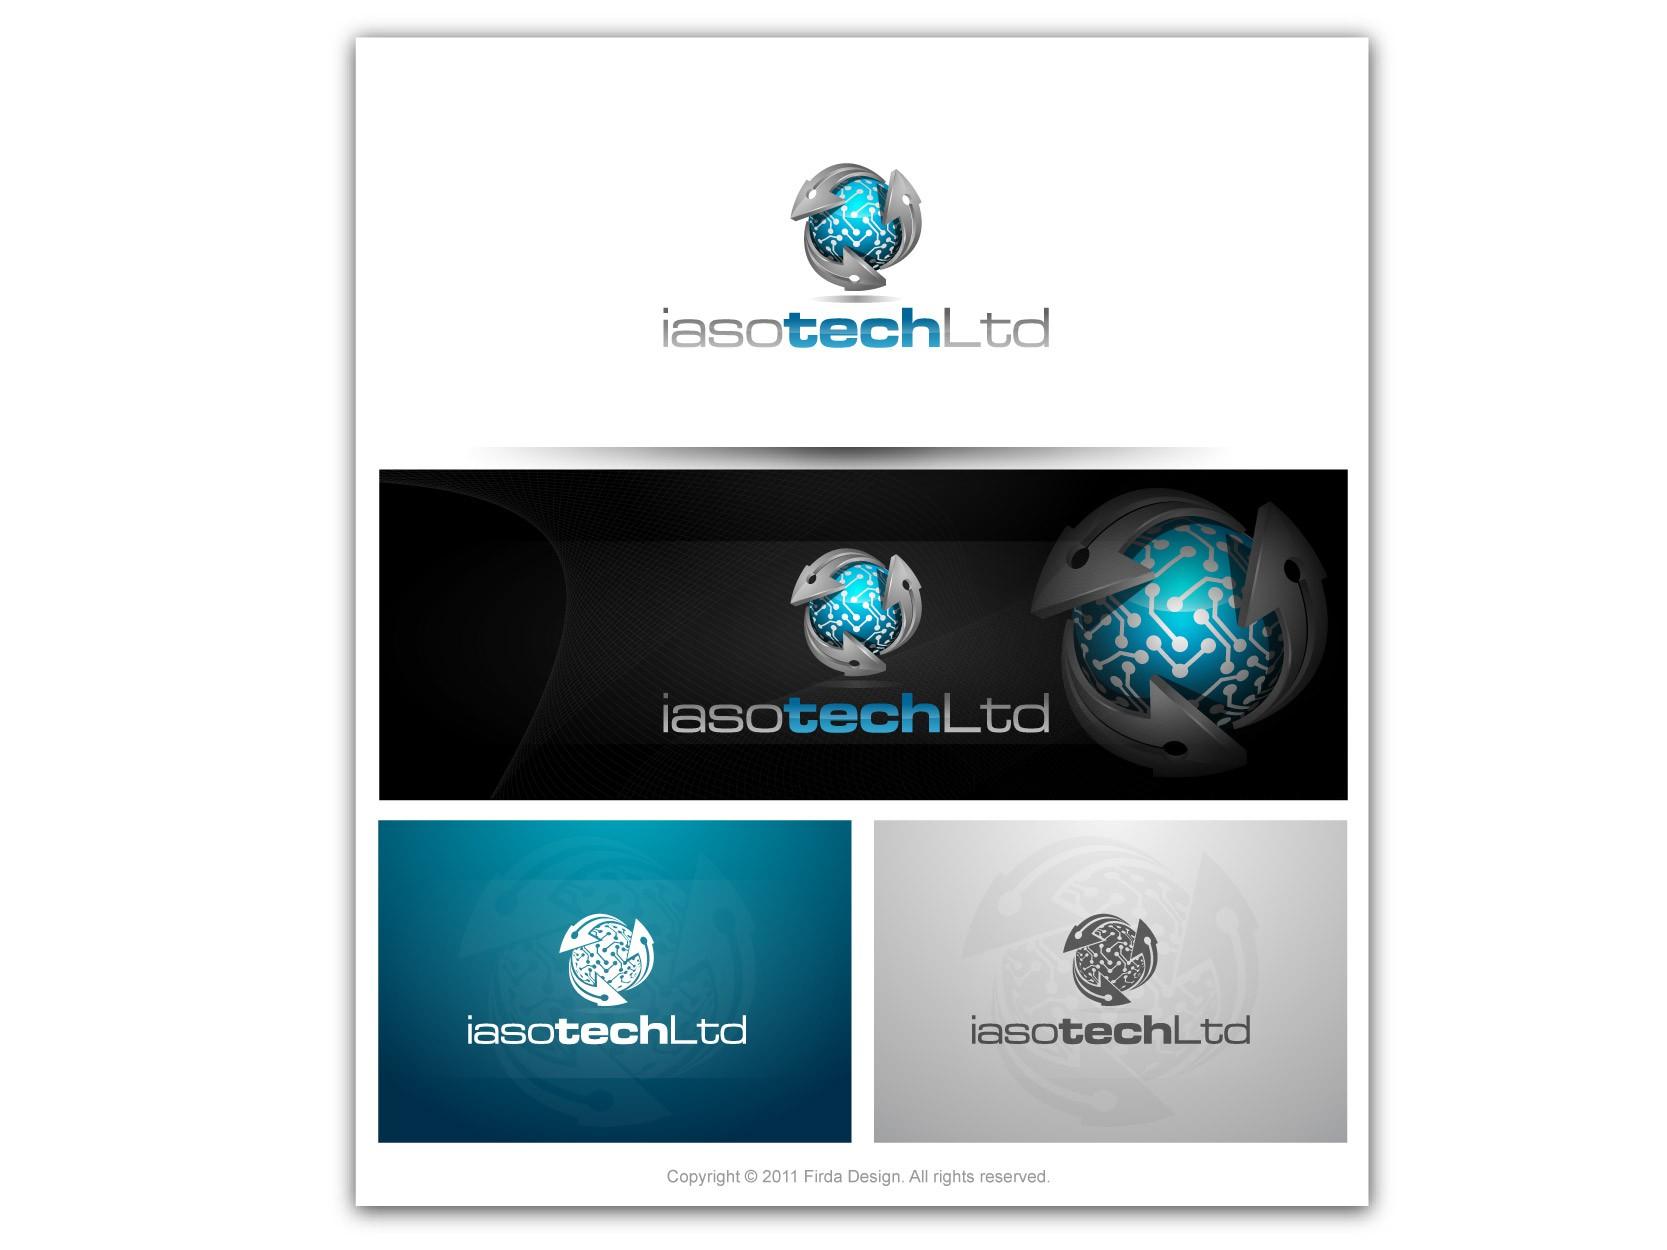 Create the next logo for iasotech Ltd